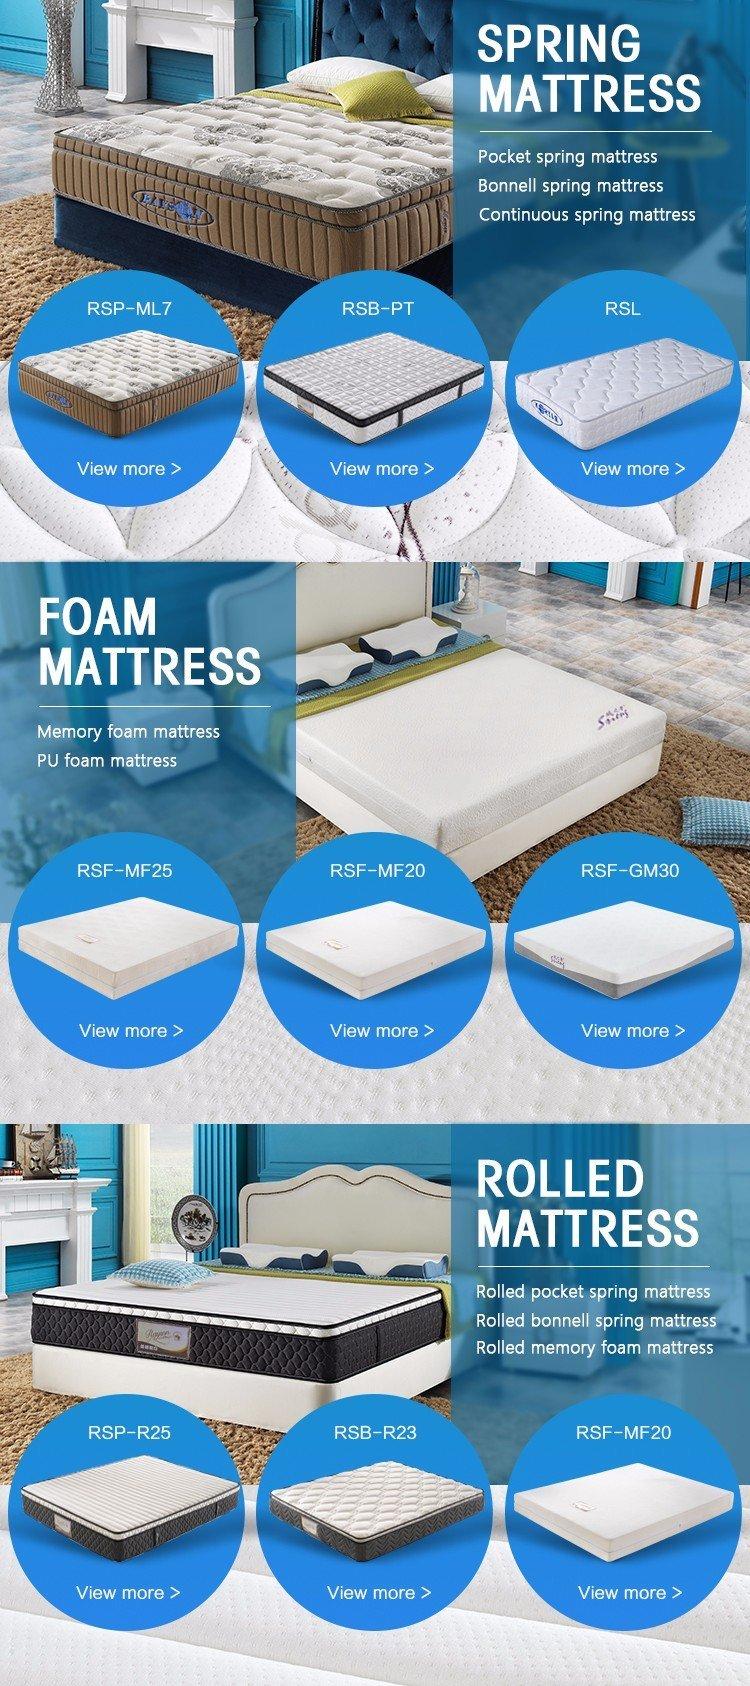 pack size bonnell spring mattress benefits market bulk Rayson Mattress company